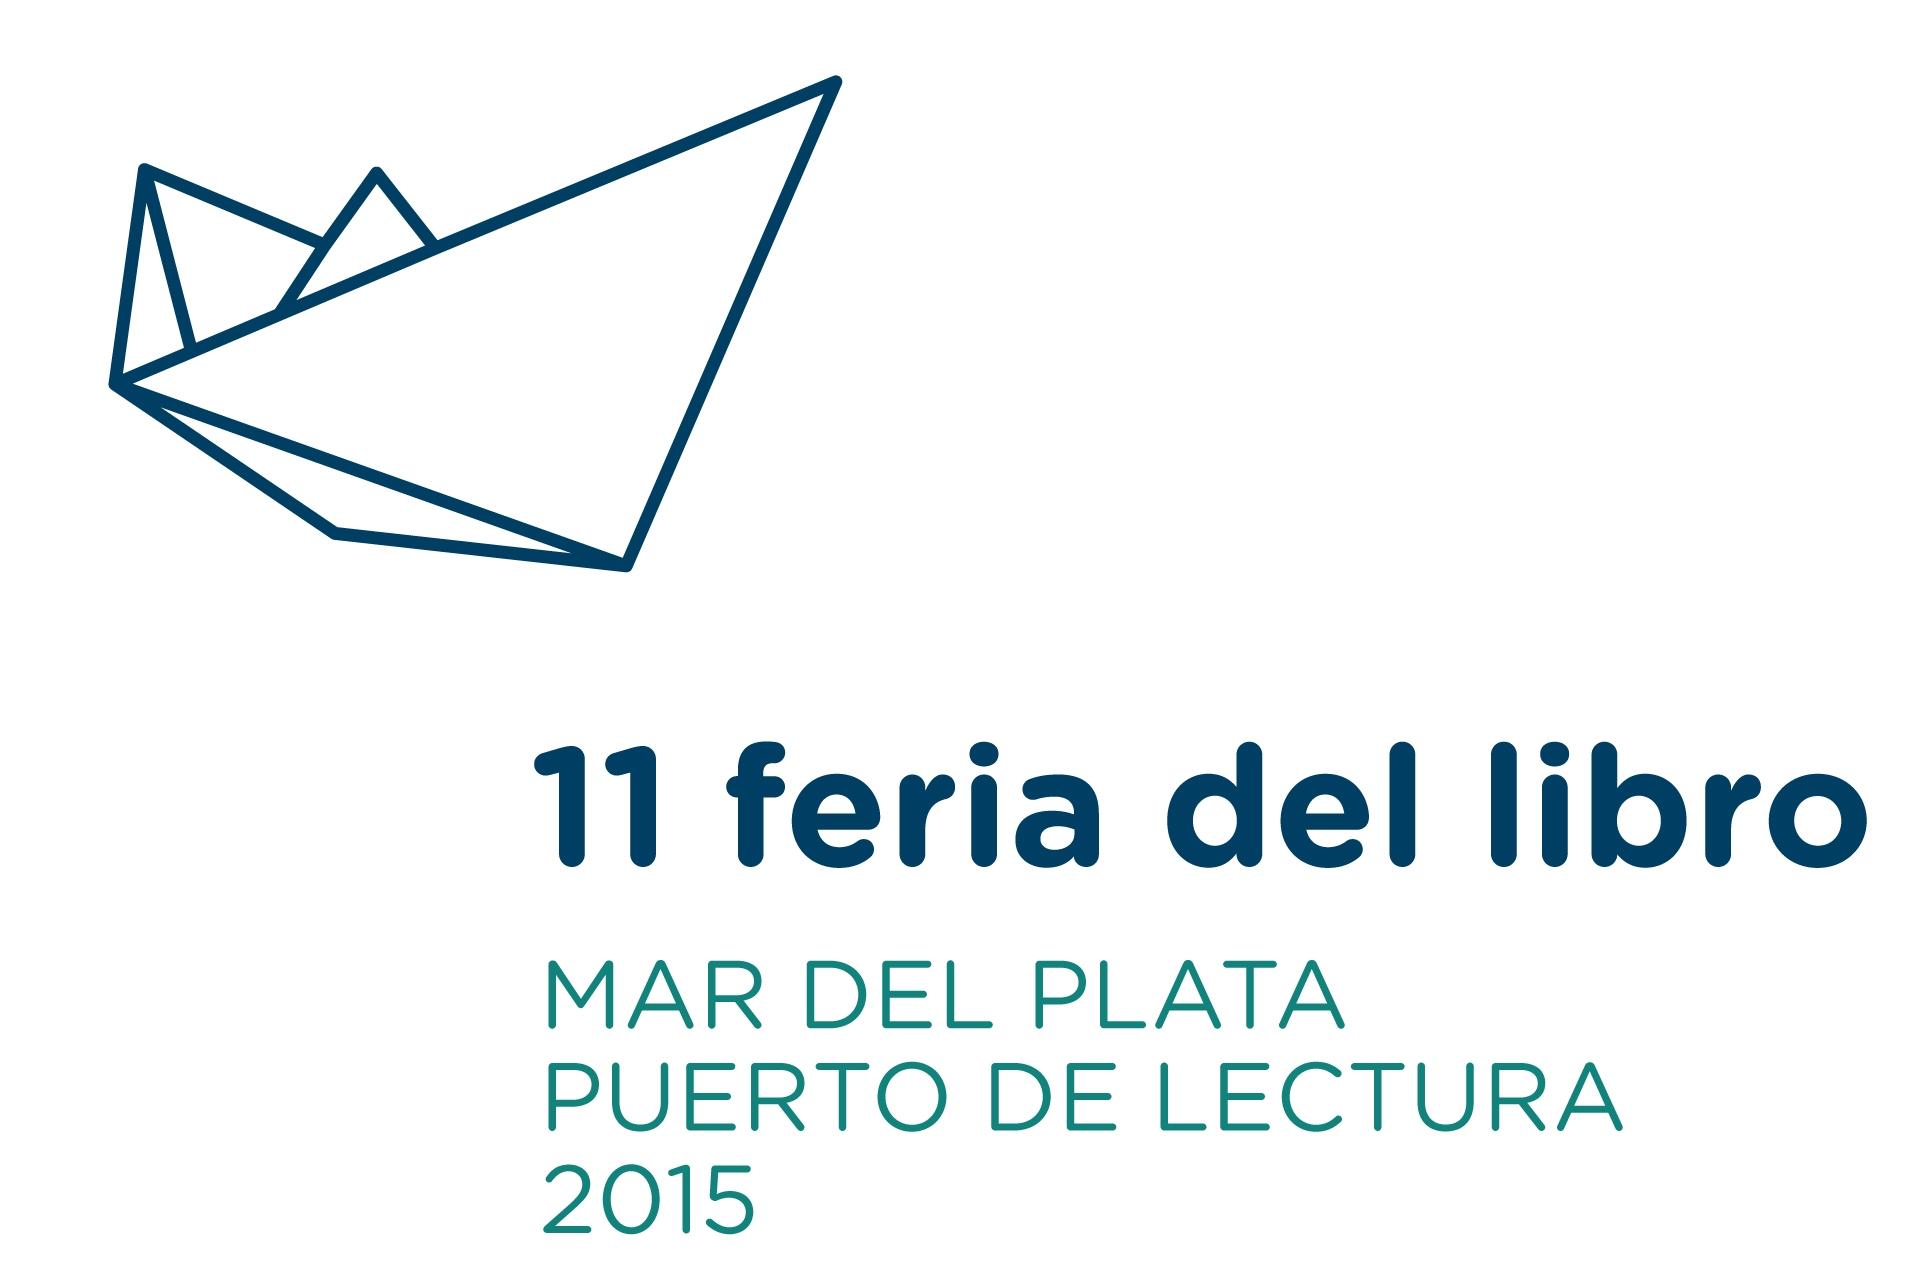 logo_feria_del_libro 2015